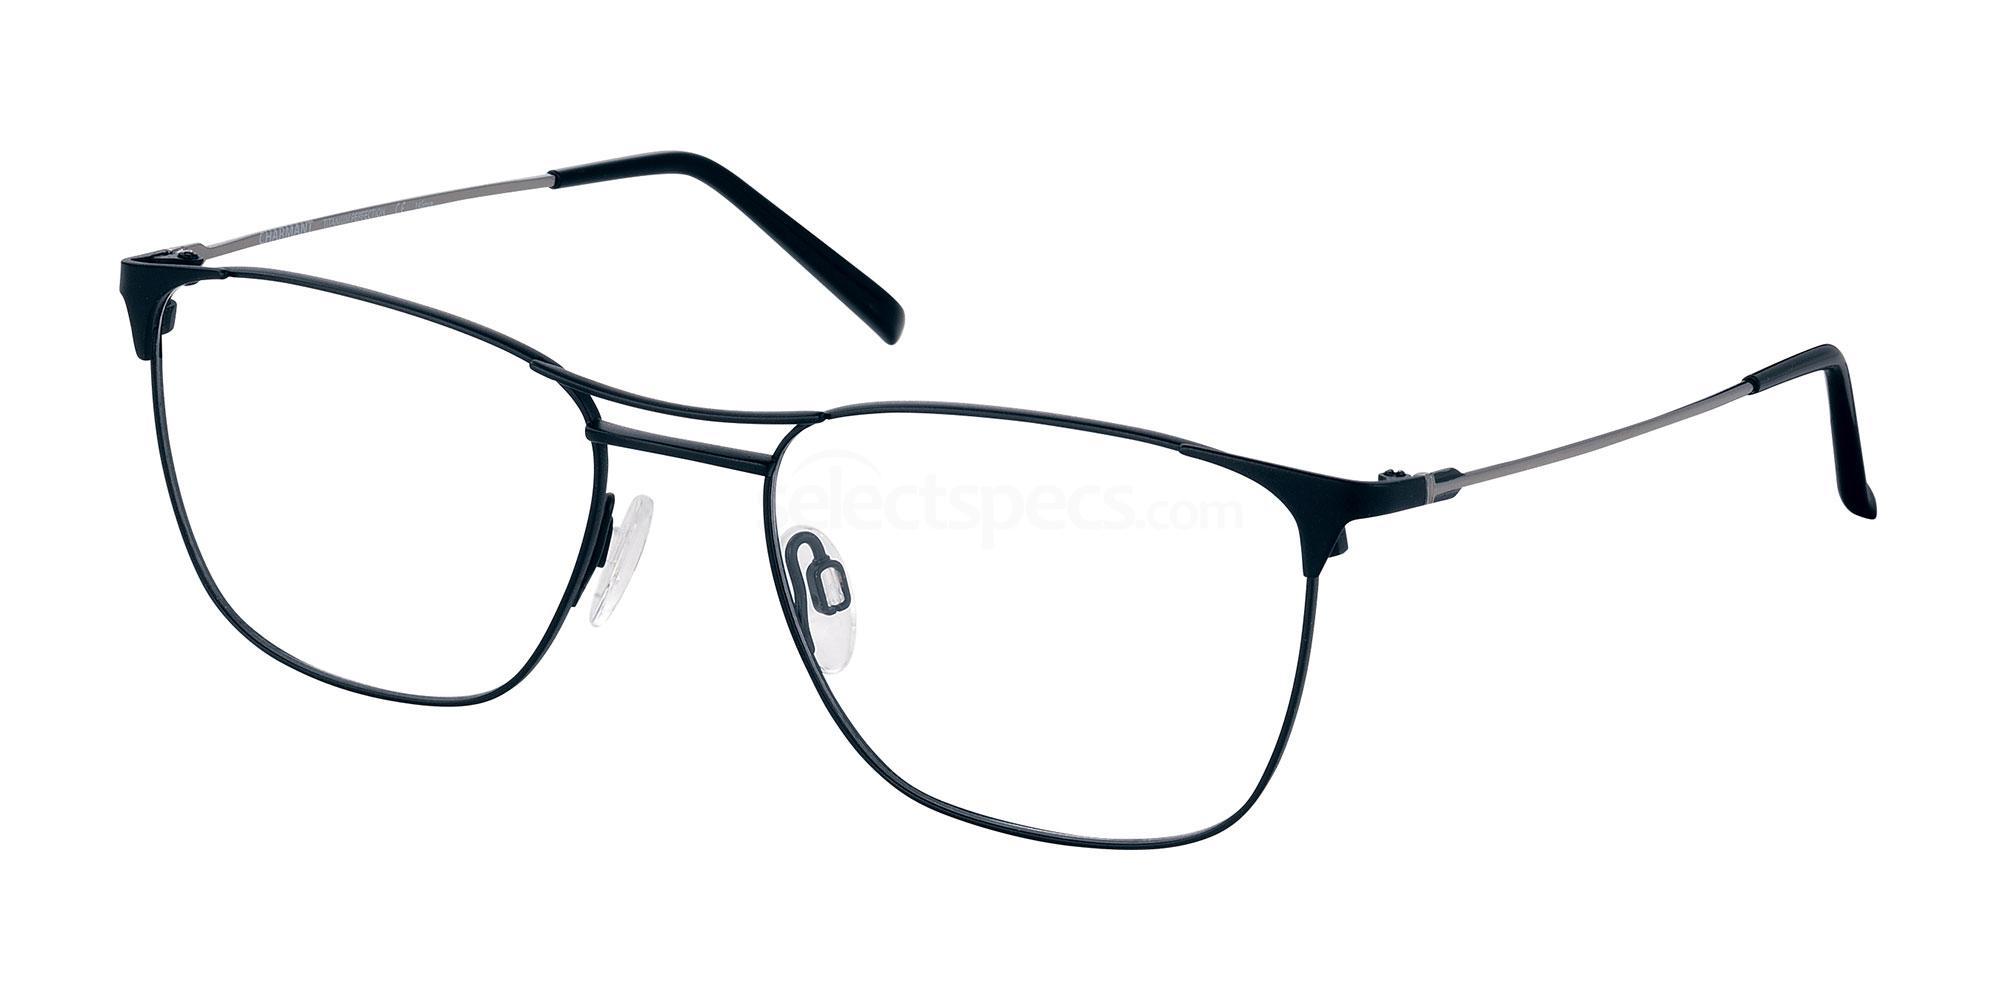 BK CH29710 Glasses, Charmant Titanium Perfection